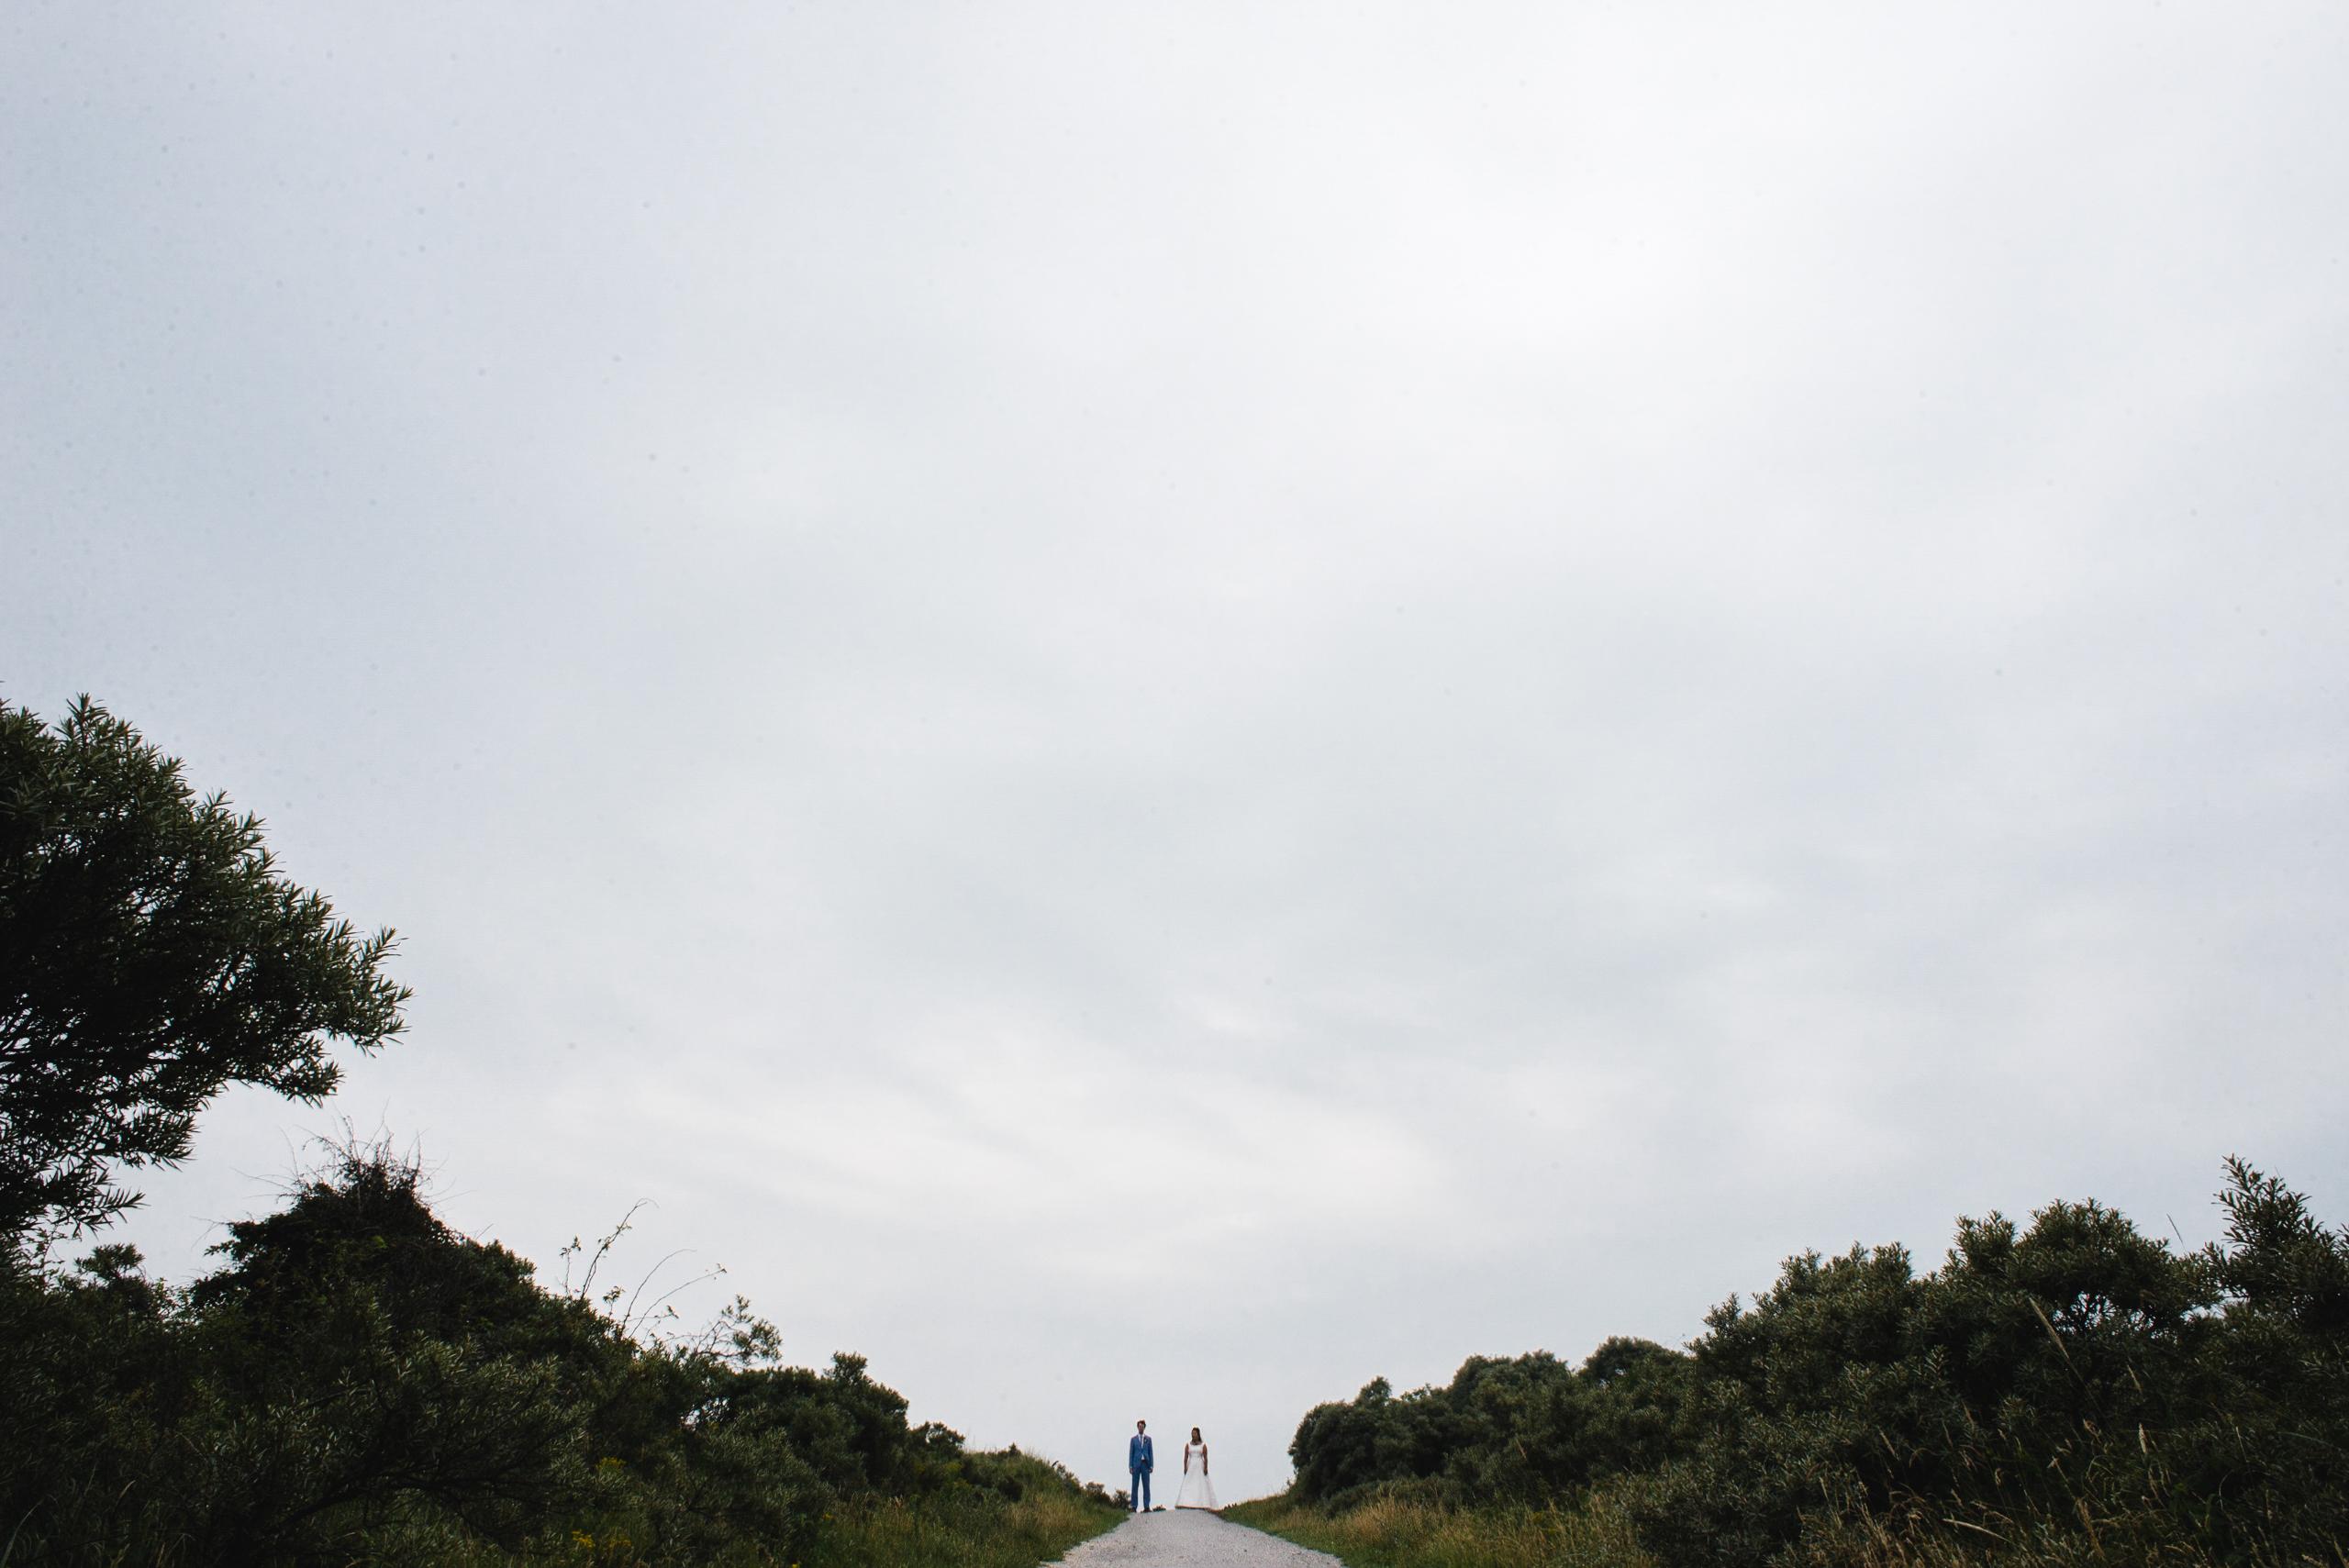 Minéan en Ruben Blog  (75 van 112)